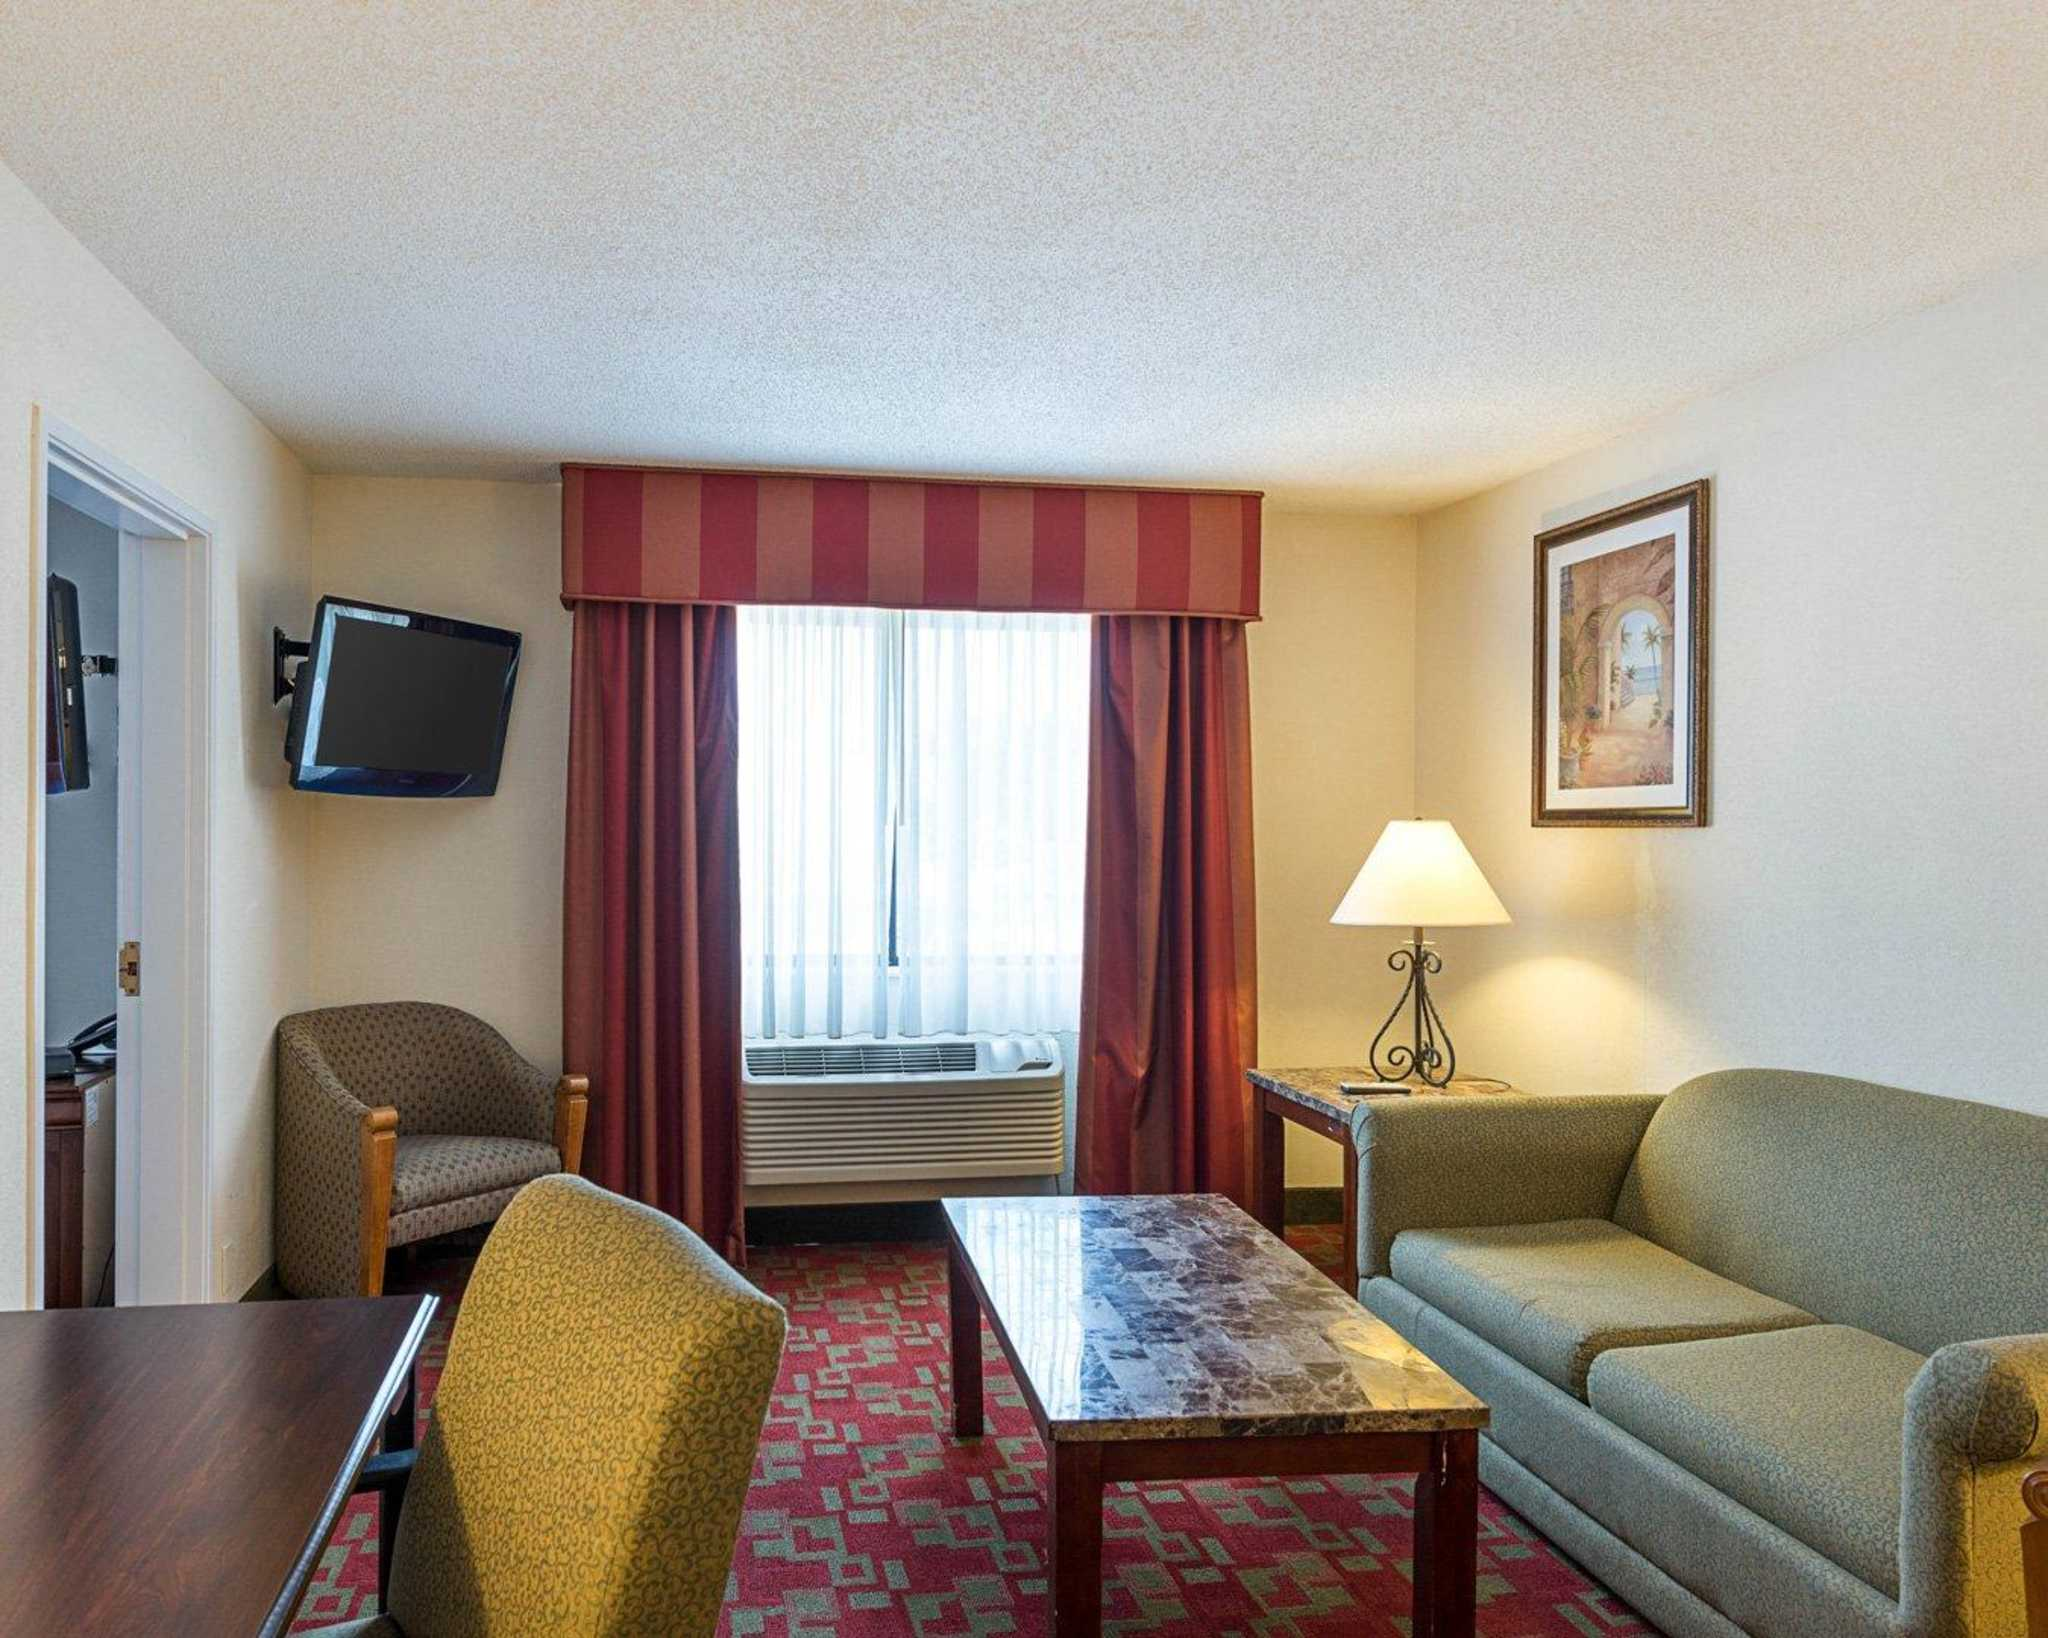 Quality Inn & Suites image 38